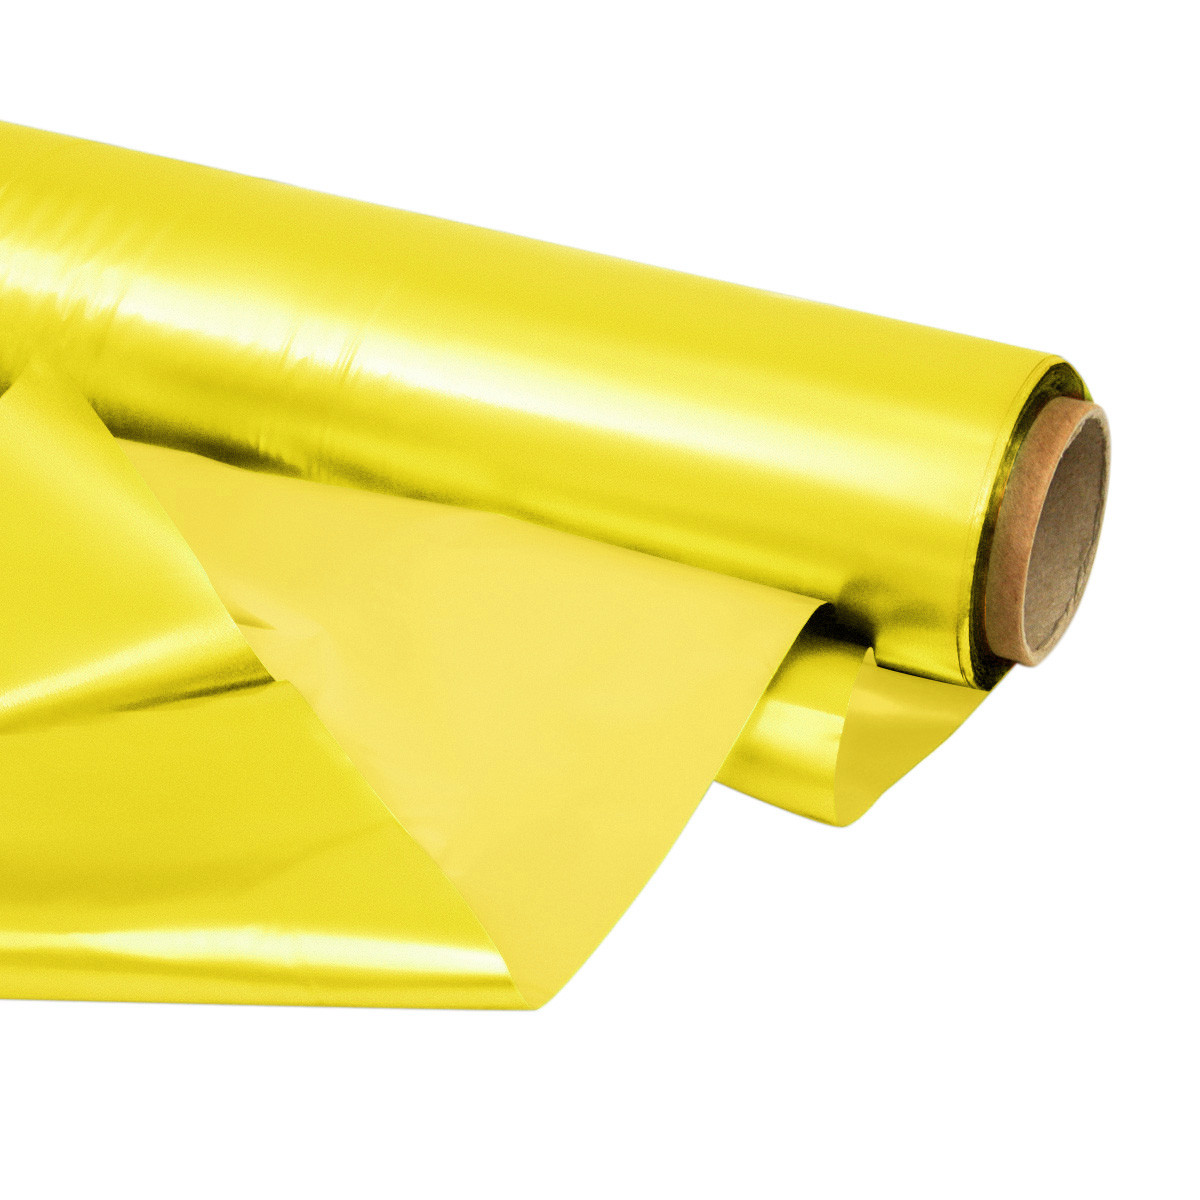 Пленка матовая желтая 70см х 10 метров